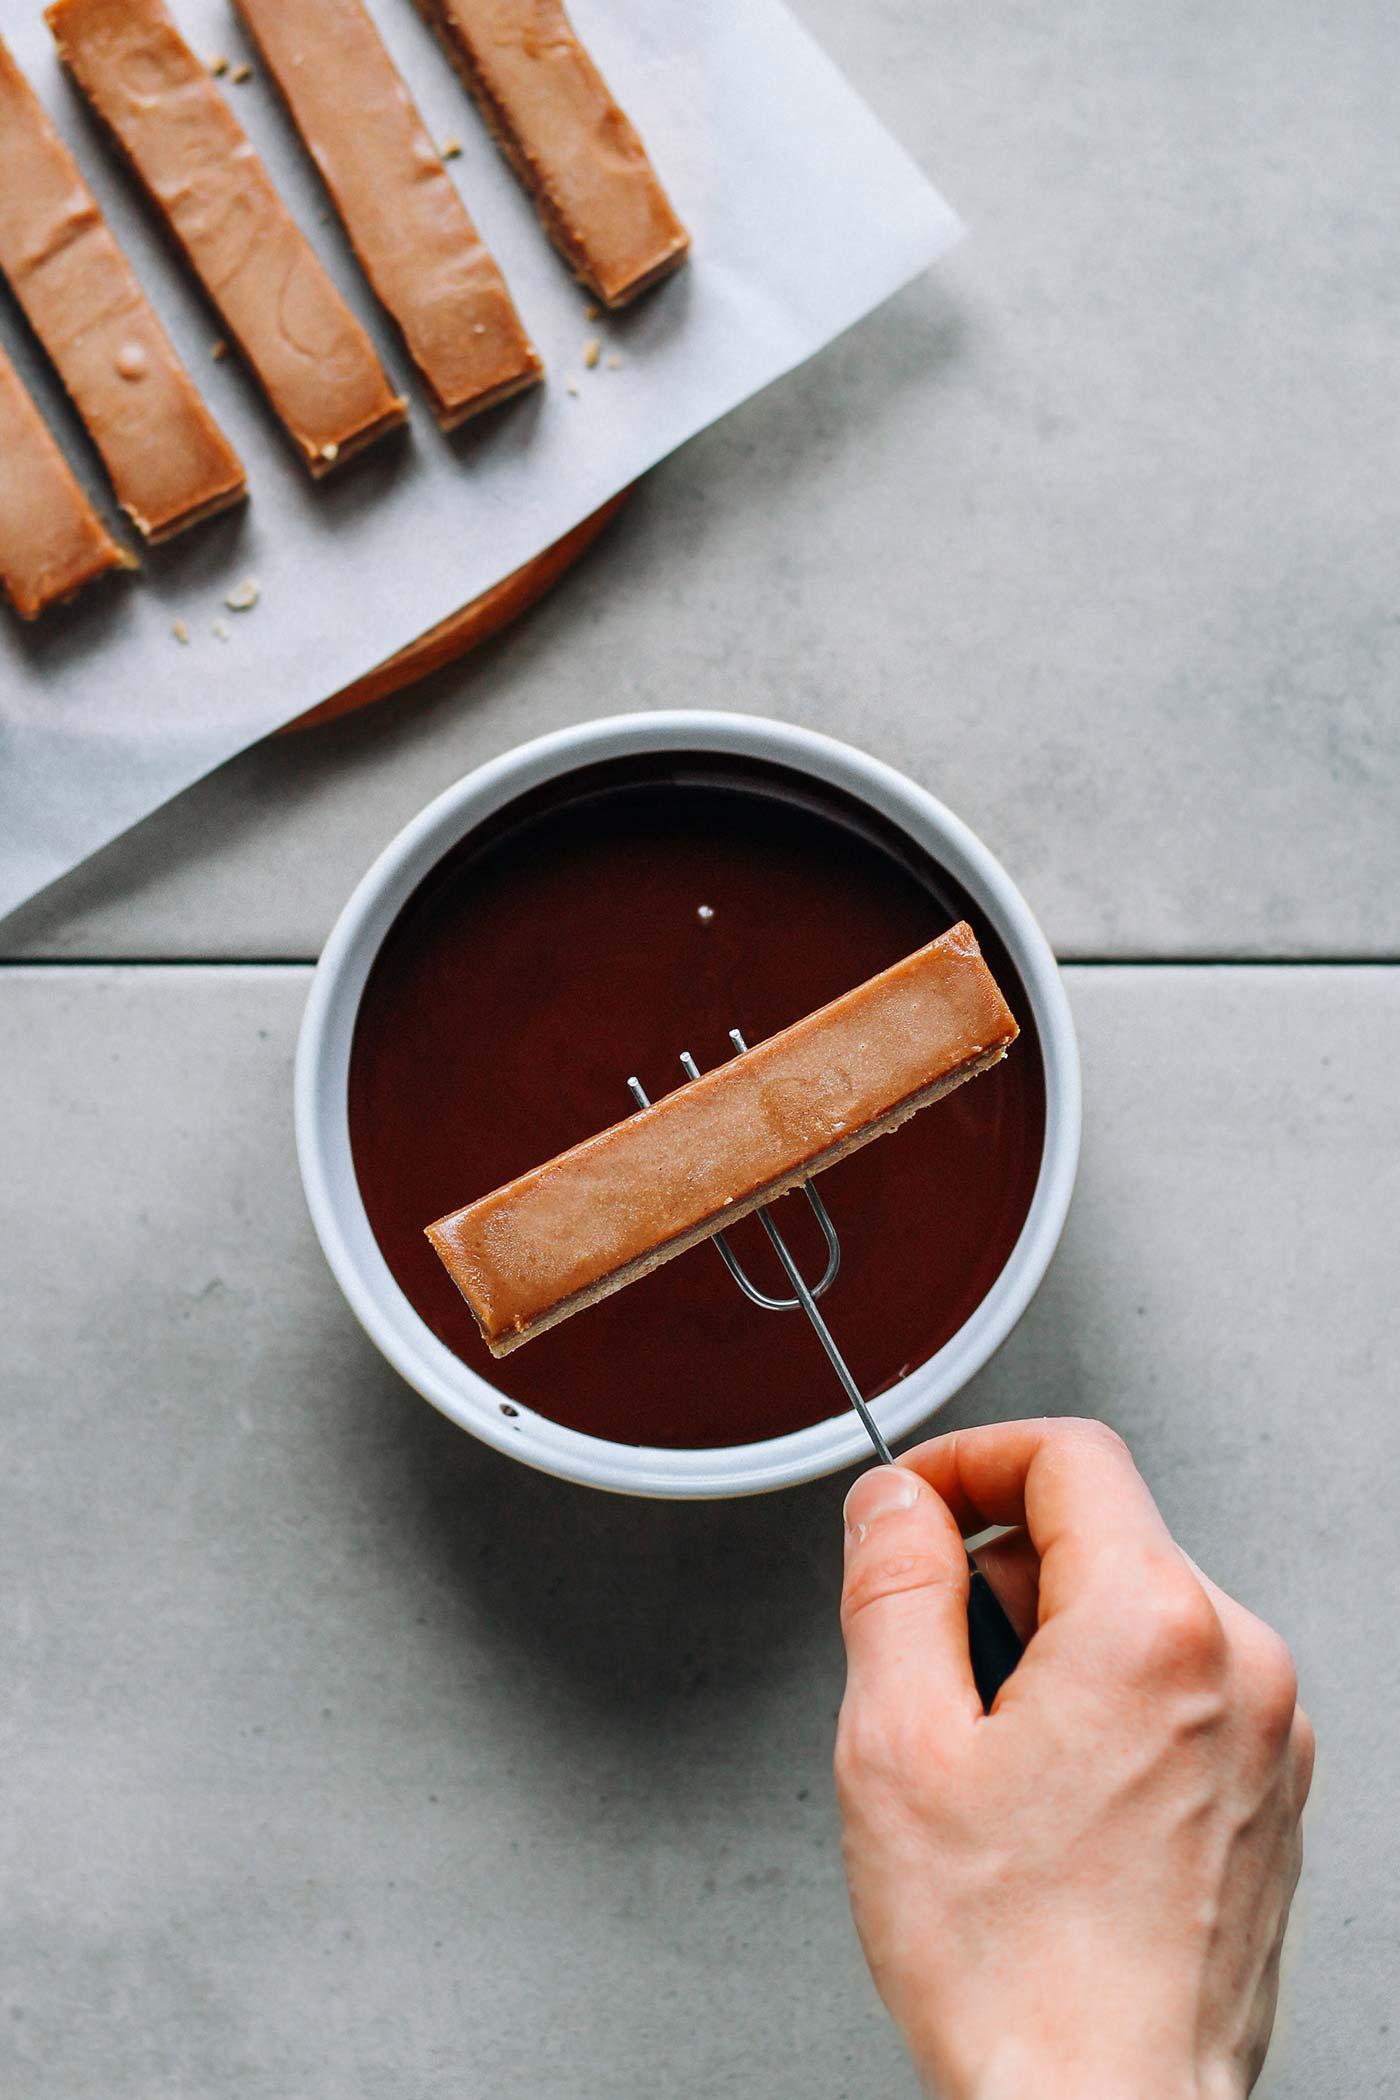 Healthier Chocolate Candy Bars (Vegan + GF)